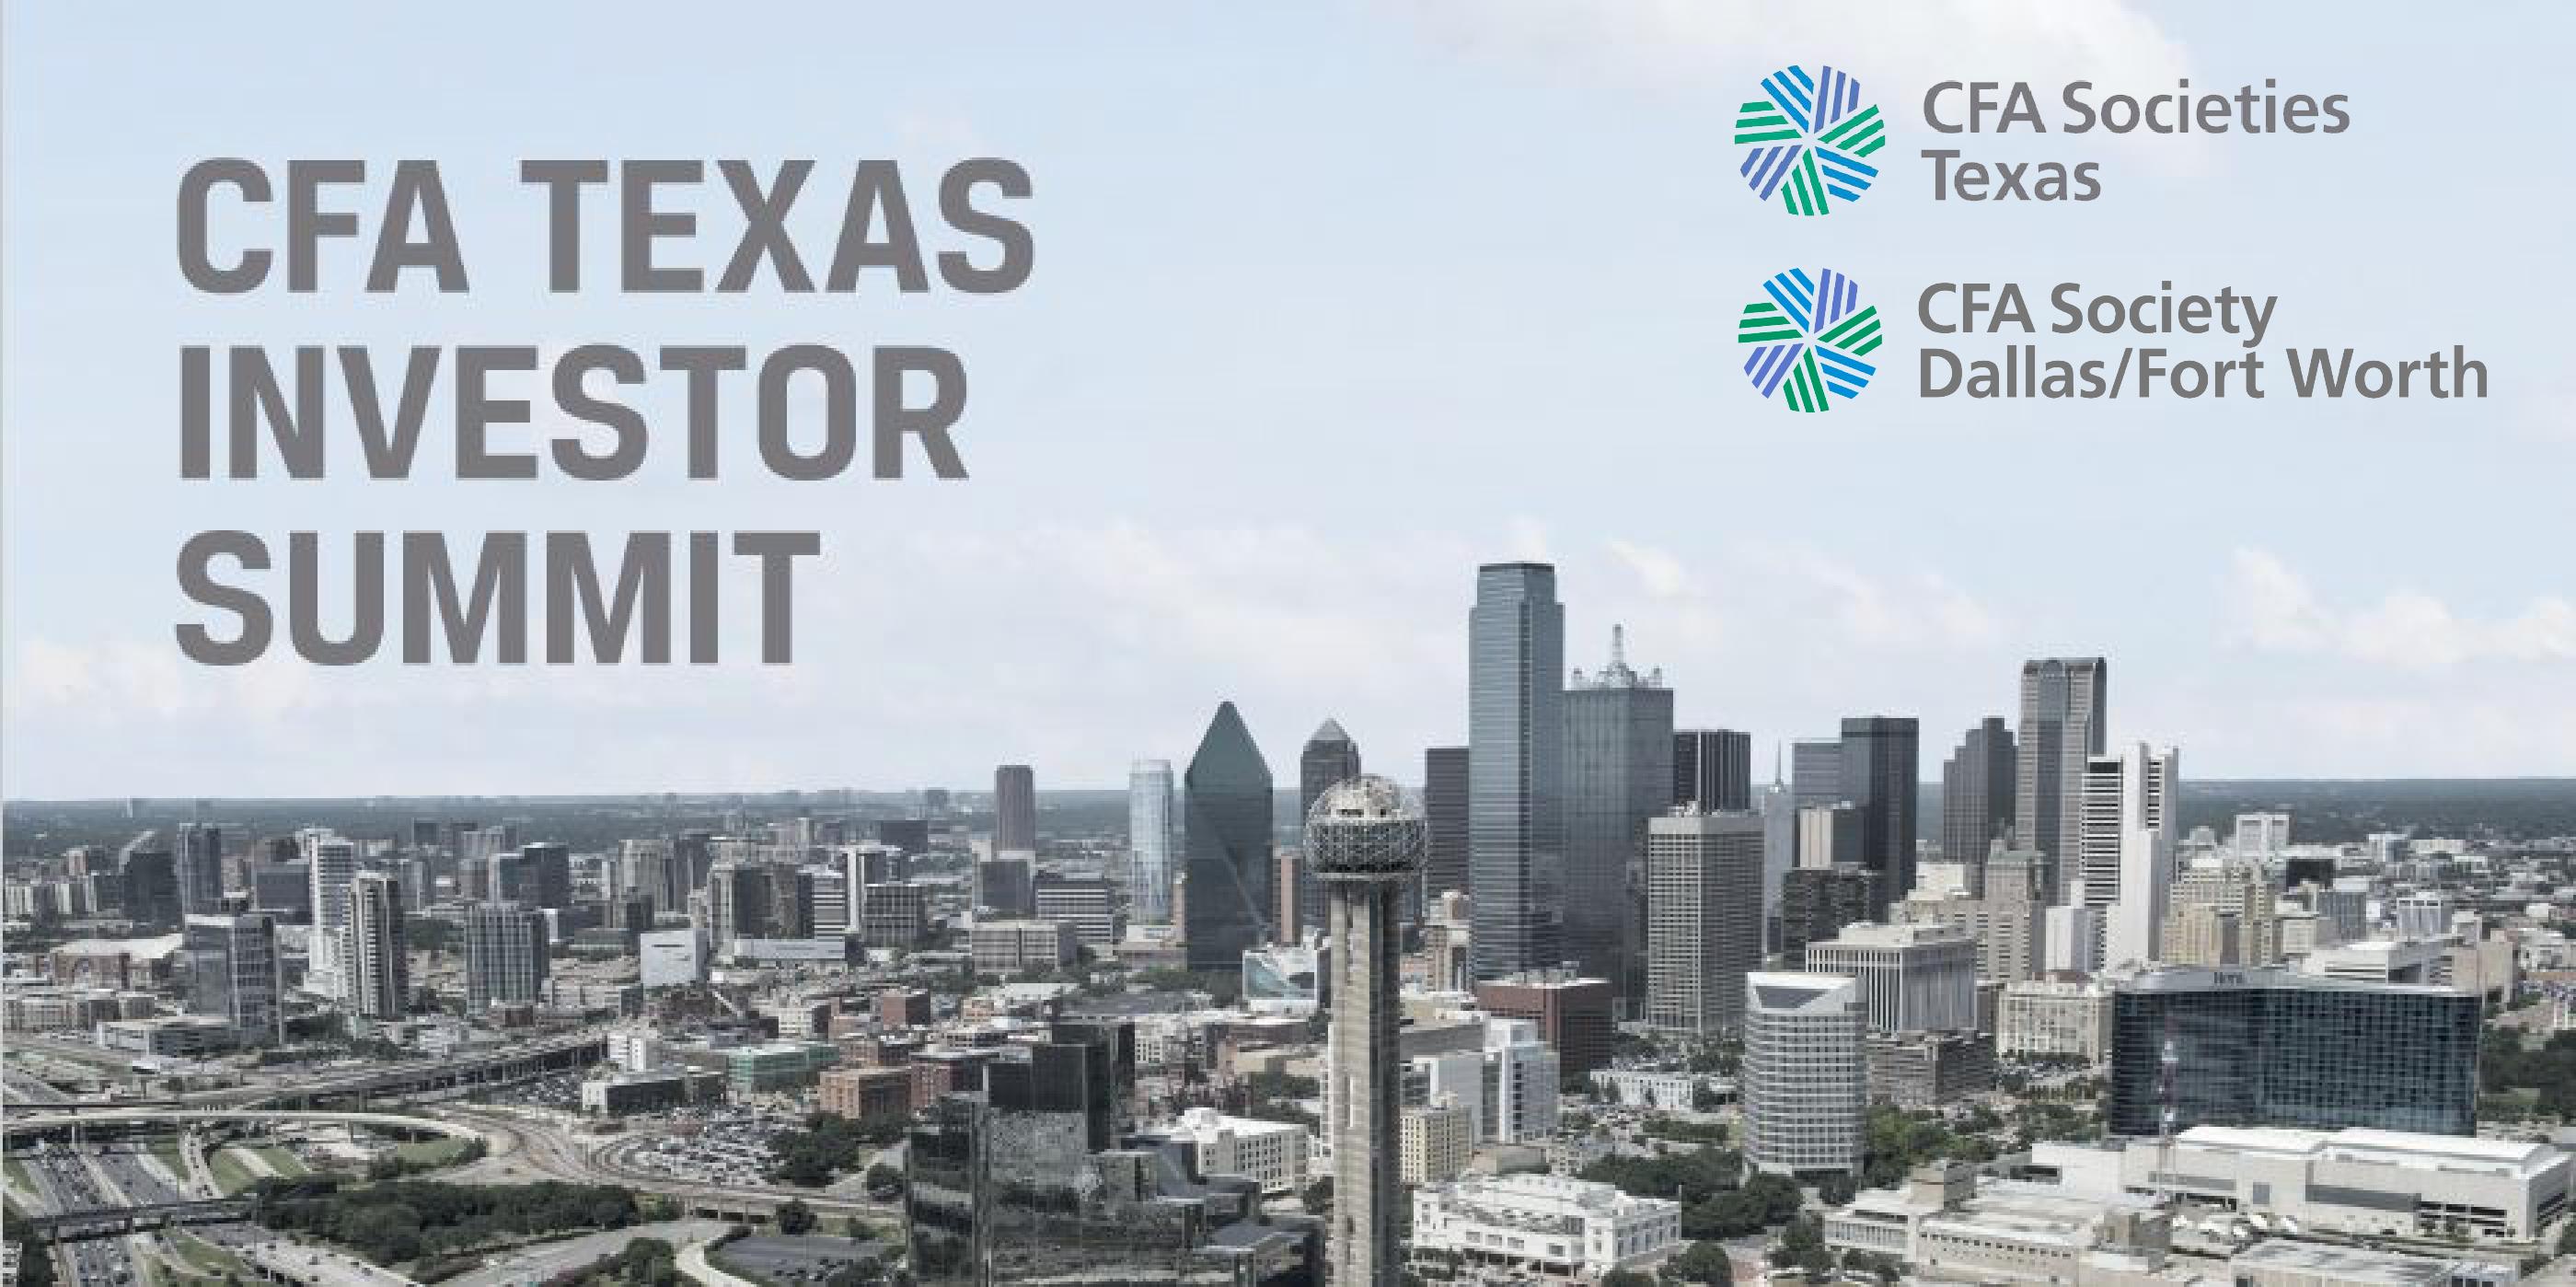 CFA Texas Investor Summit 2018: Forecast Dinner and Symposium